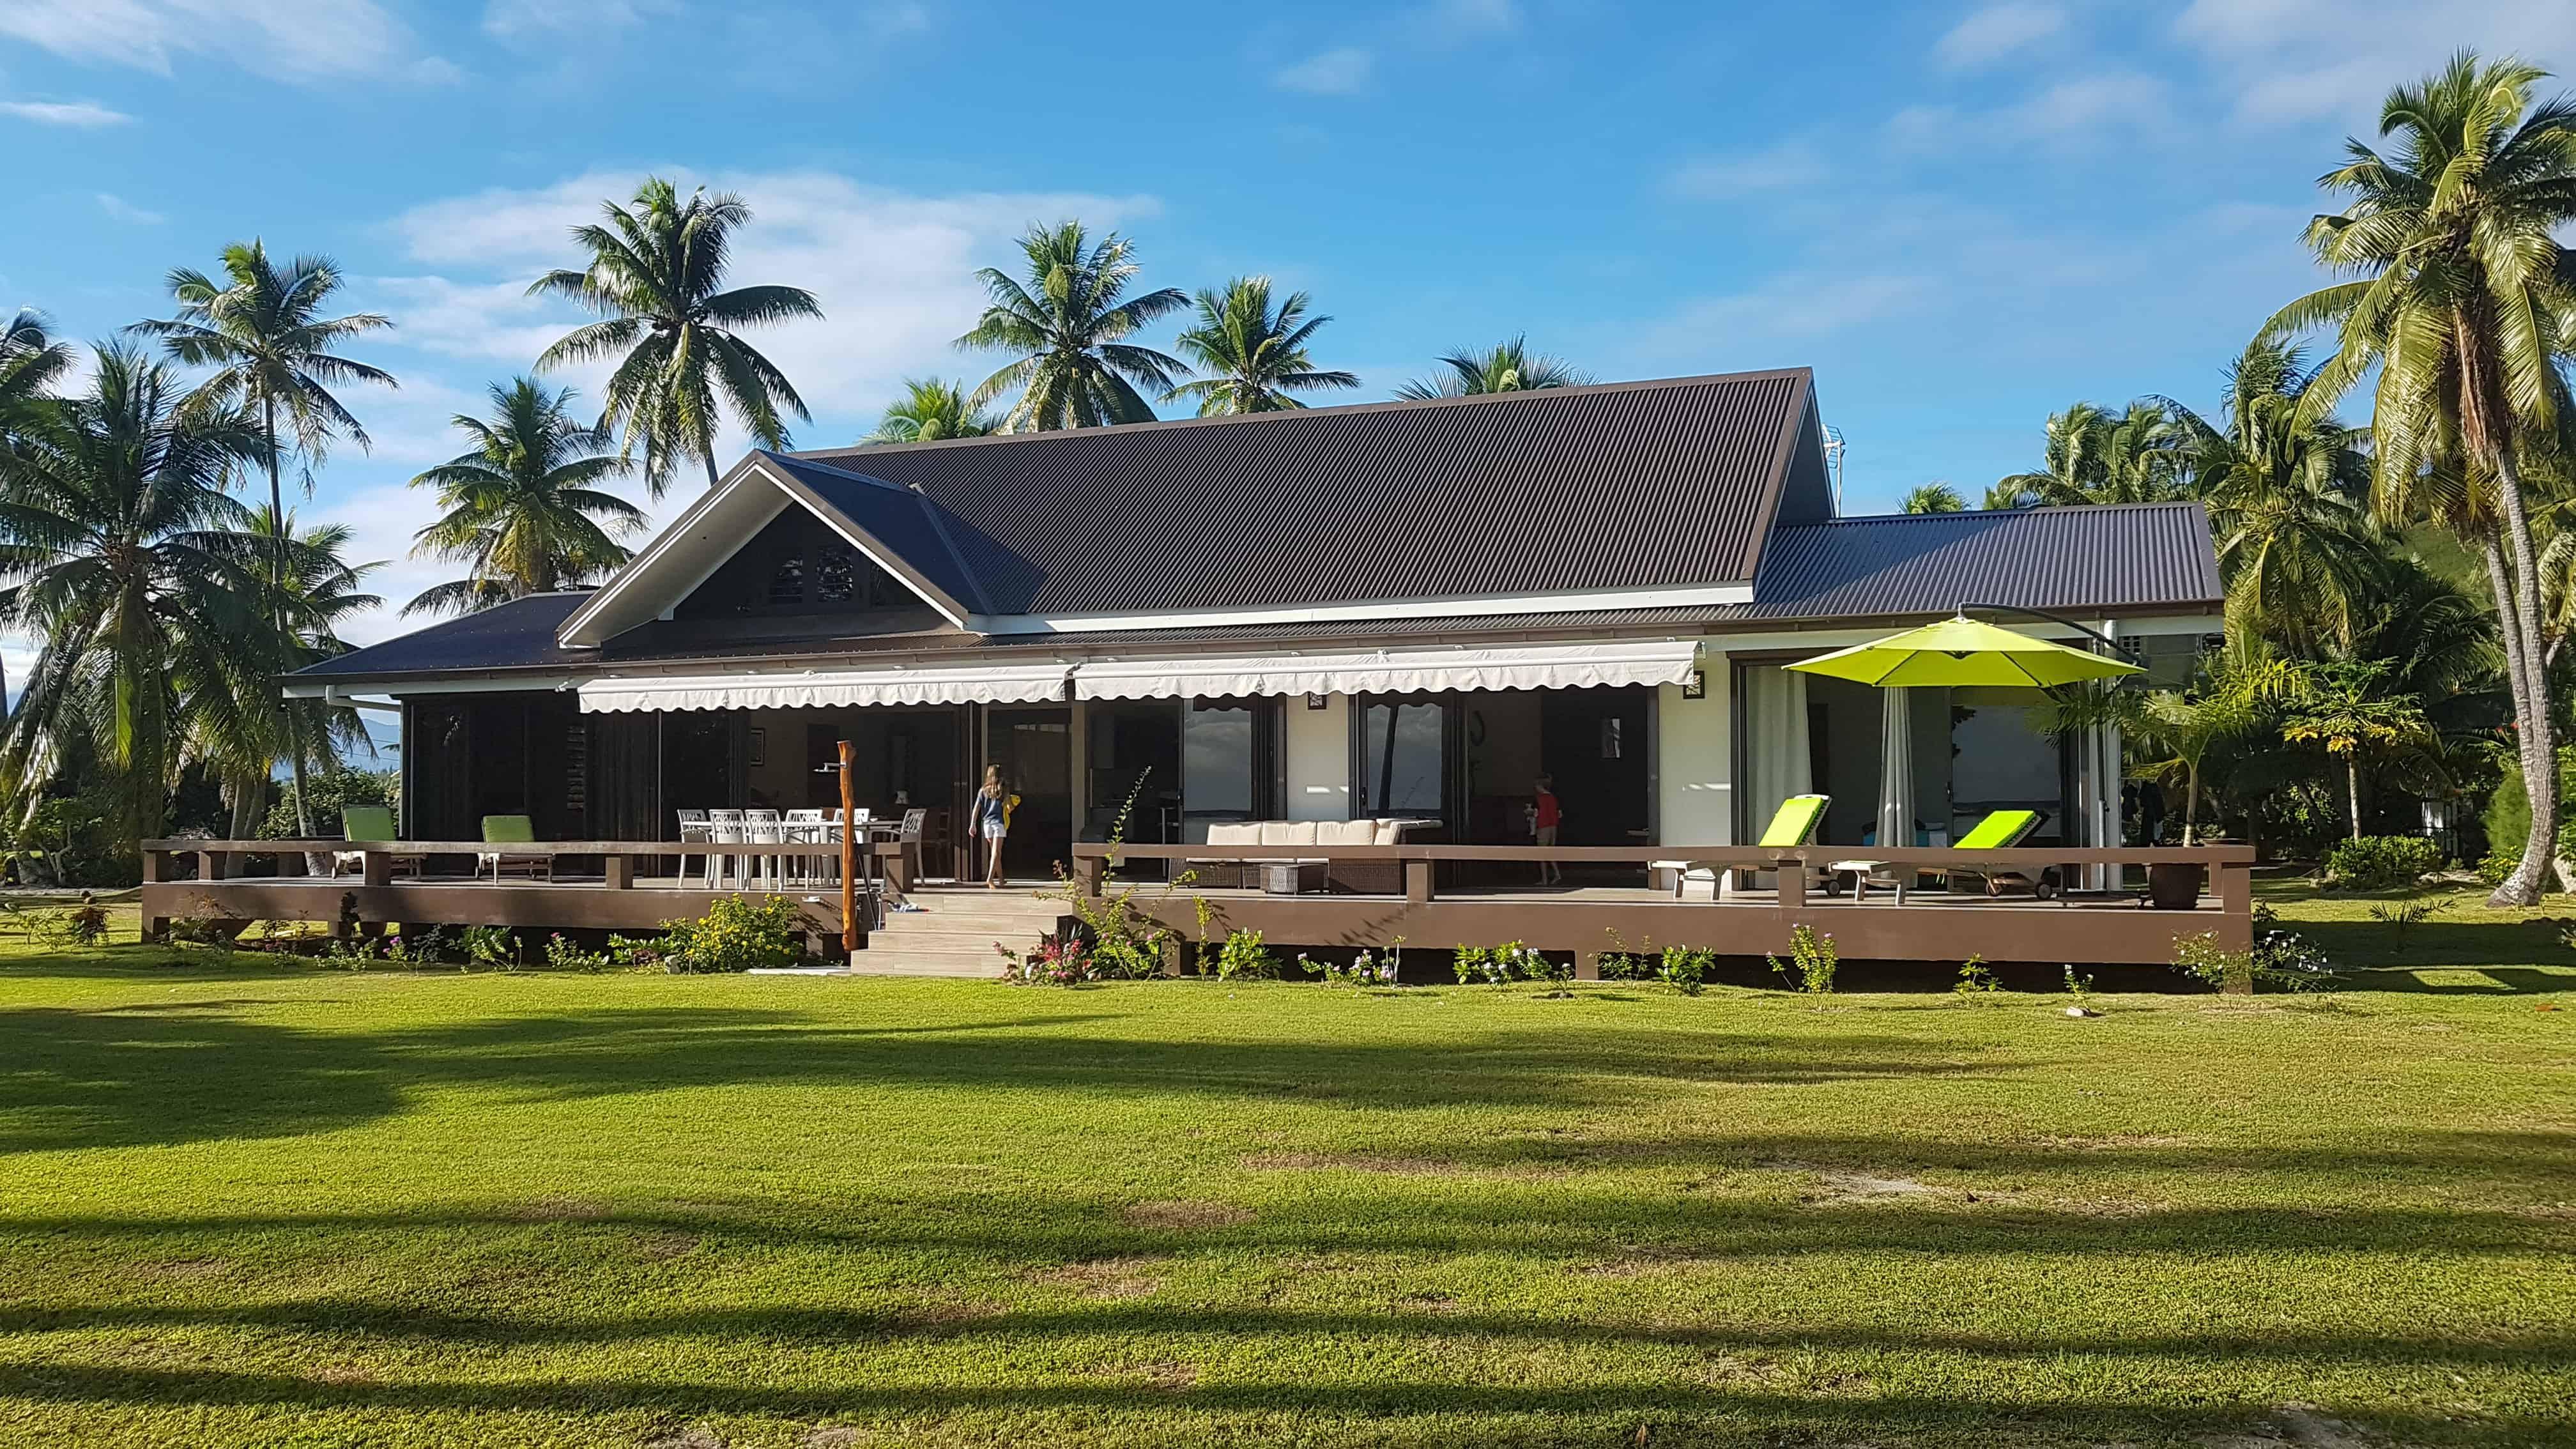 https://tahititourisme.de/wp-content/uploads/2018/09/Villa-Tiarenui-by-Tahiti-Homes-®-a-Moorea-4.jpg